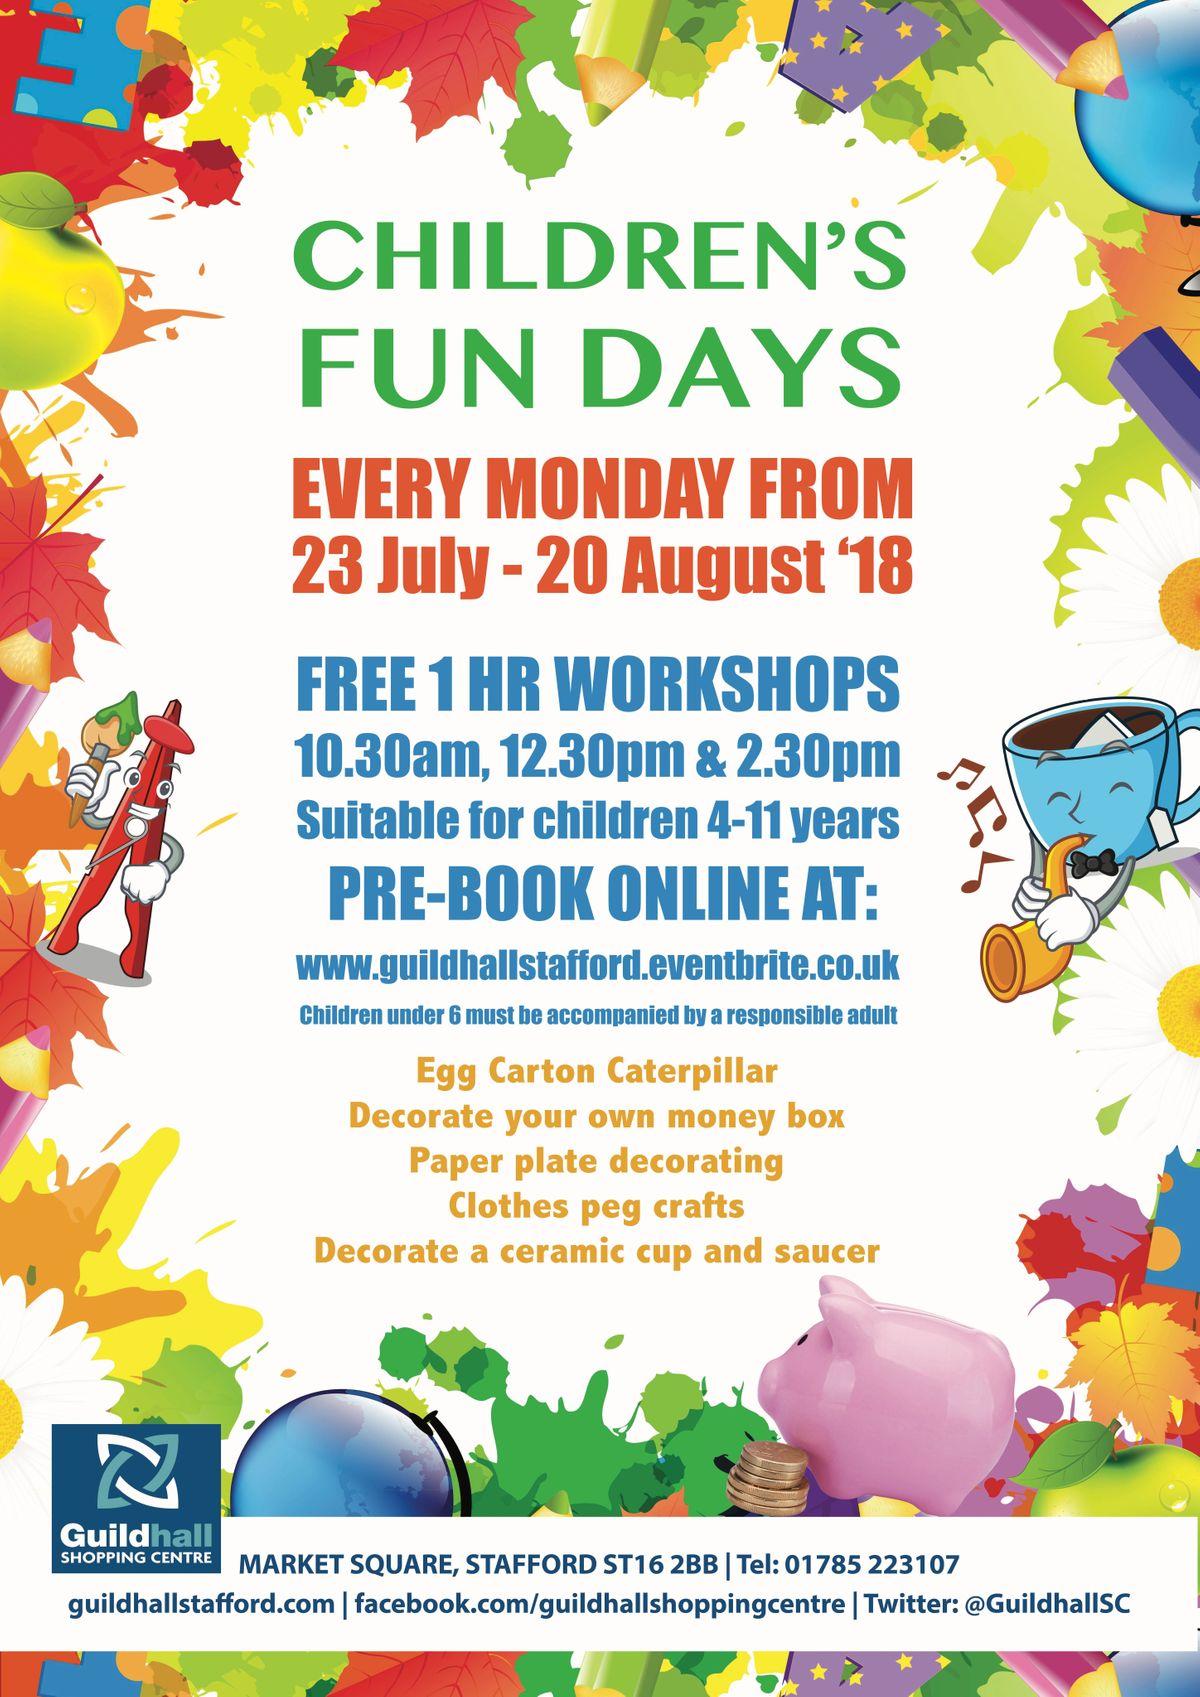 Childrens Monday Fundays - Clothes Peg Crafts